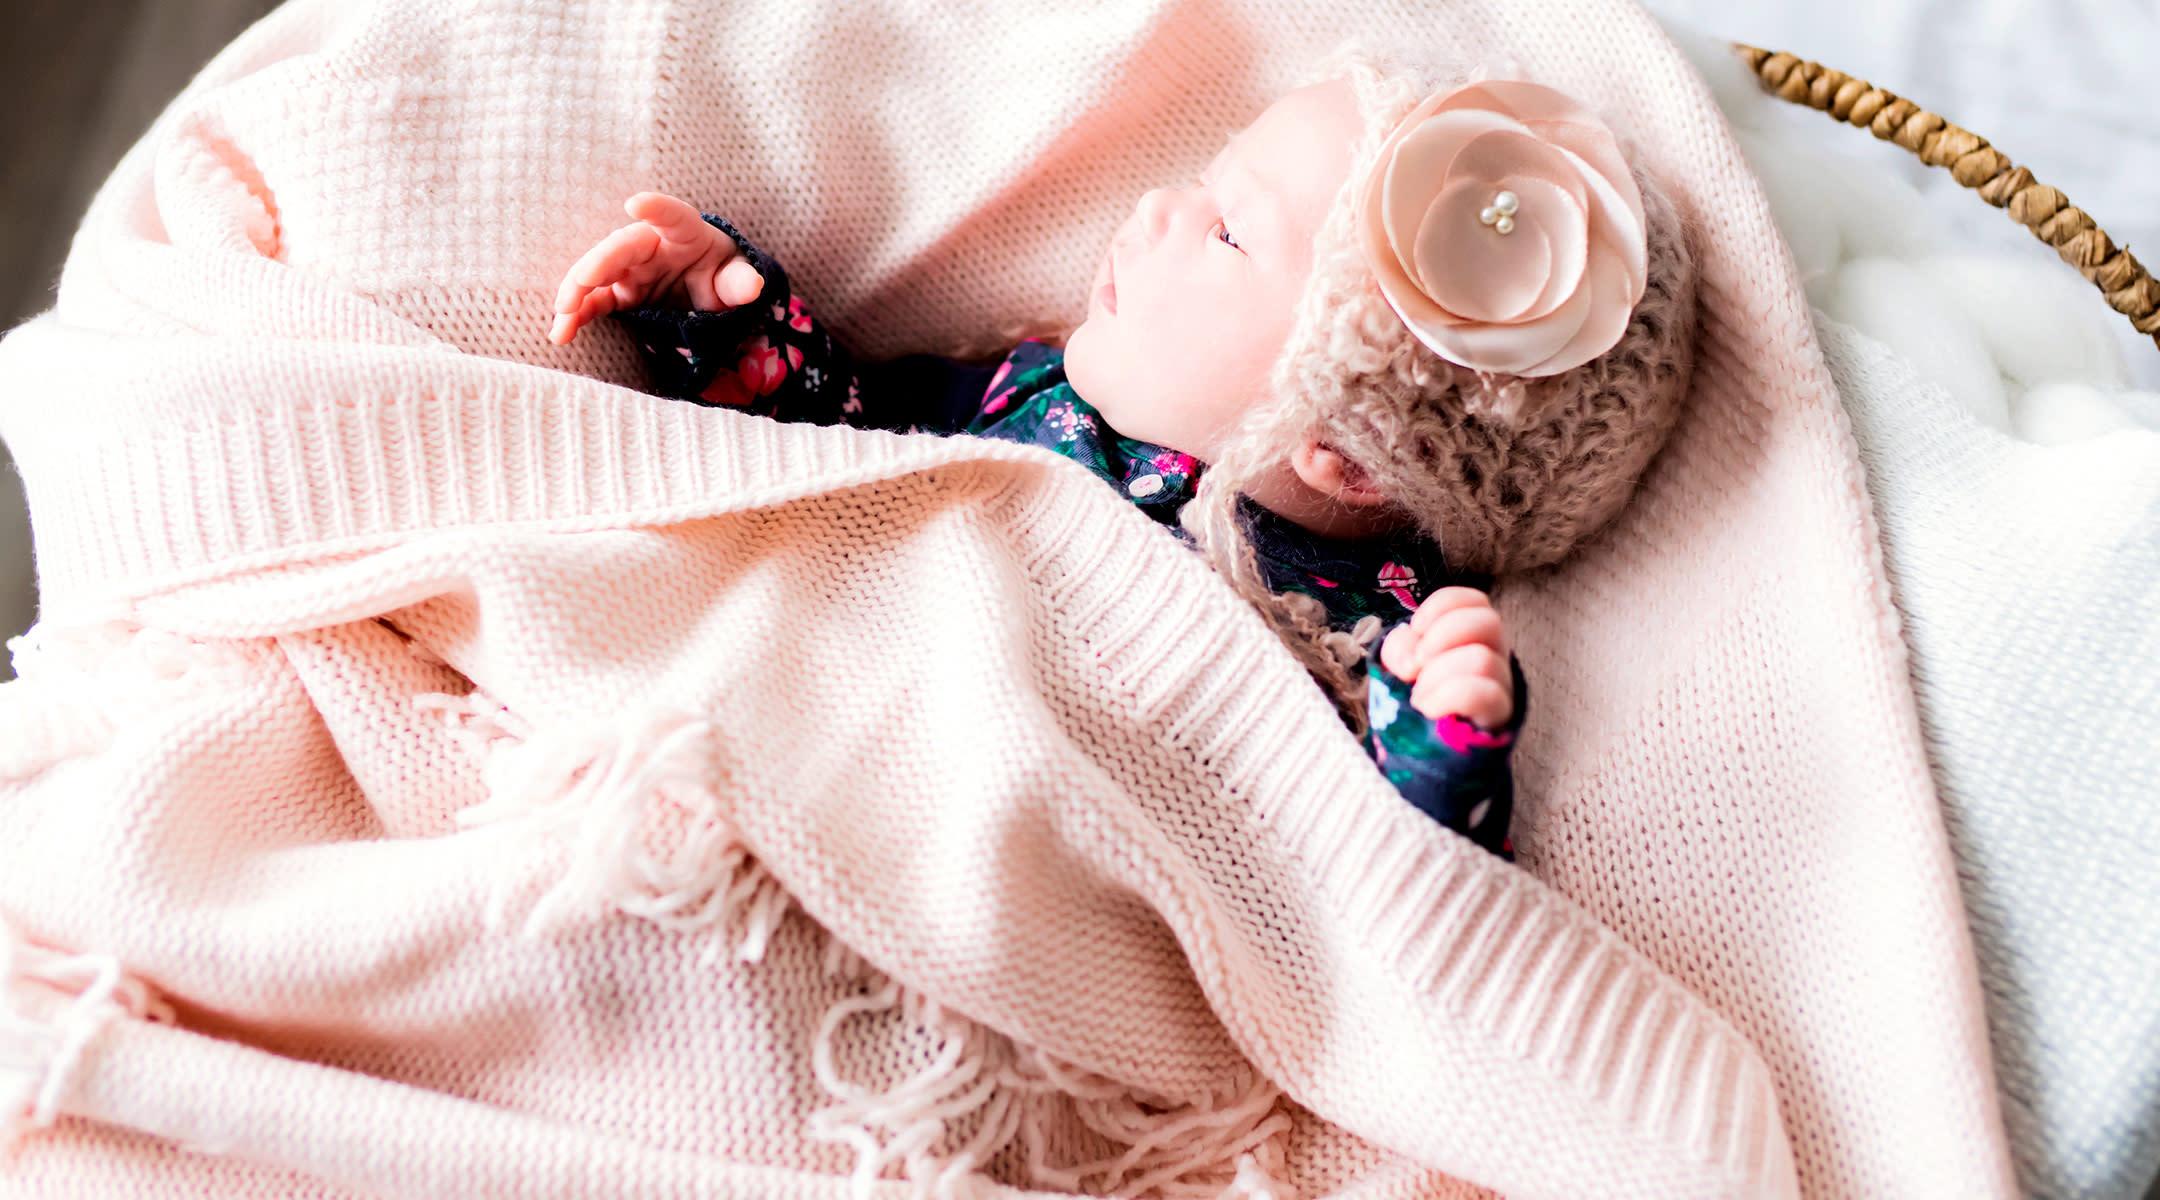 newborn baby wearing a pink knit hat